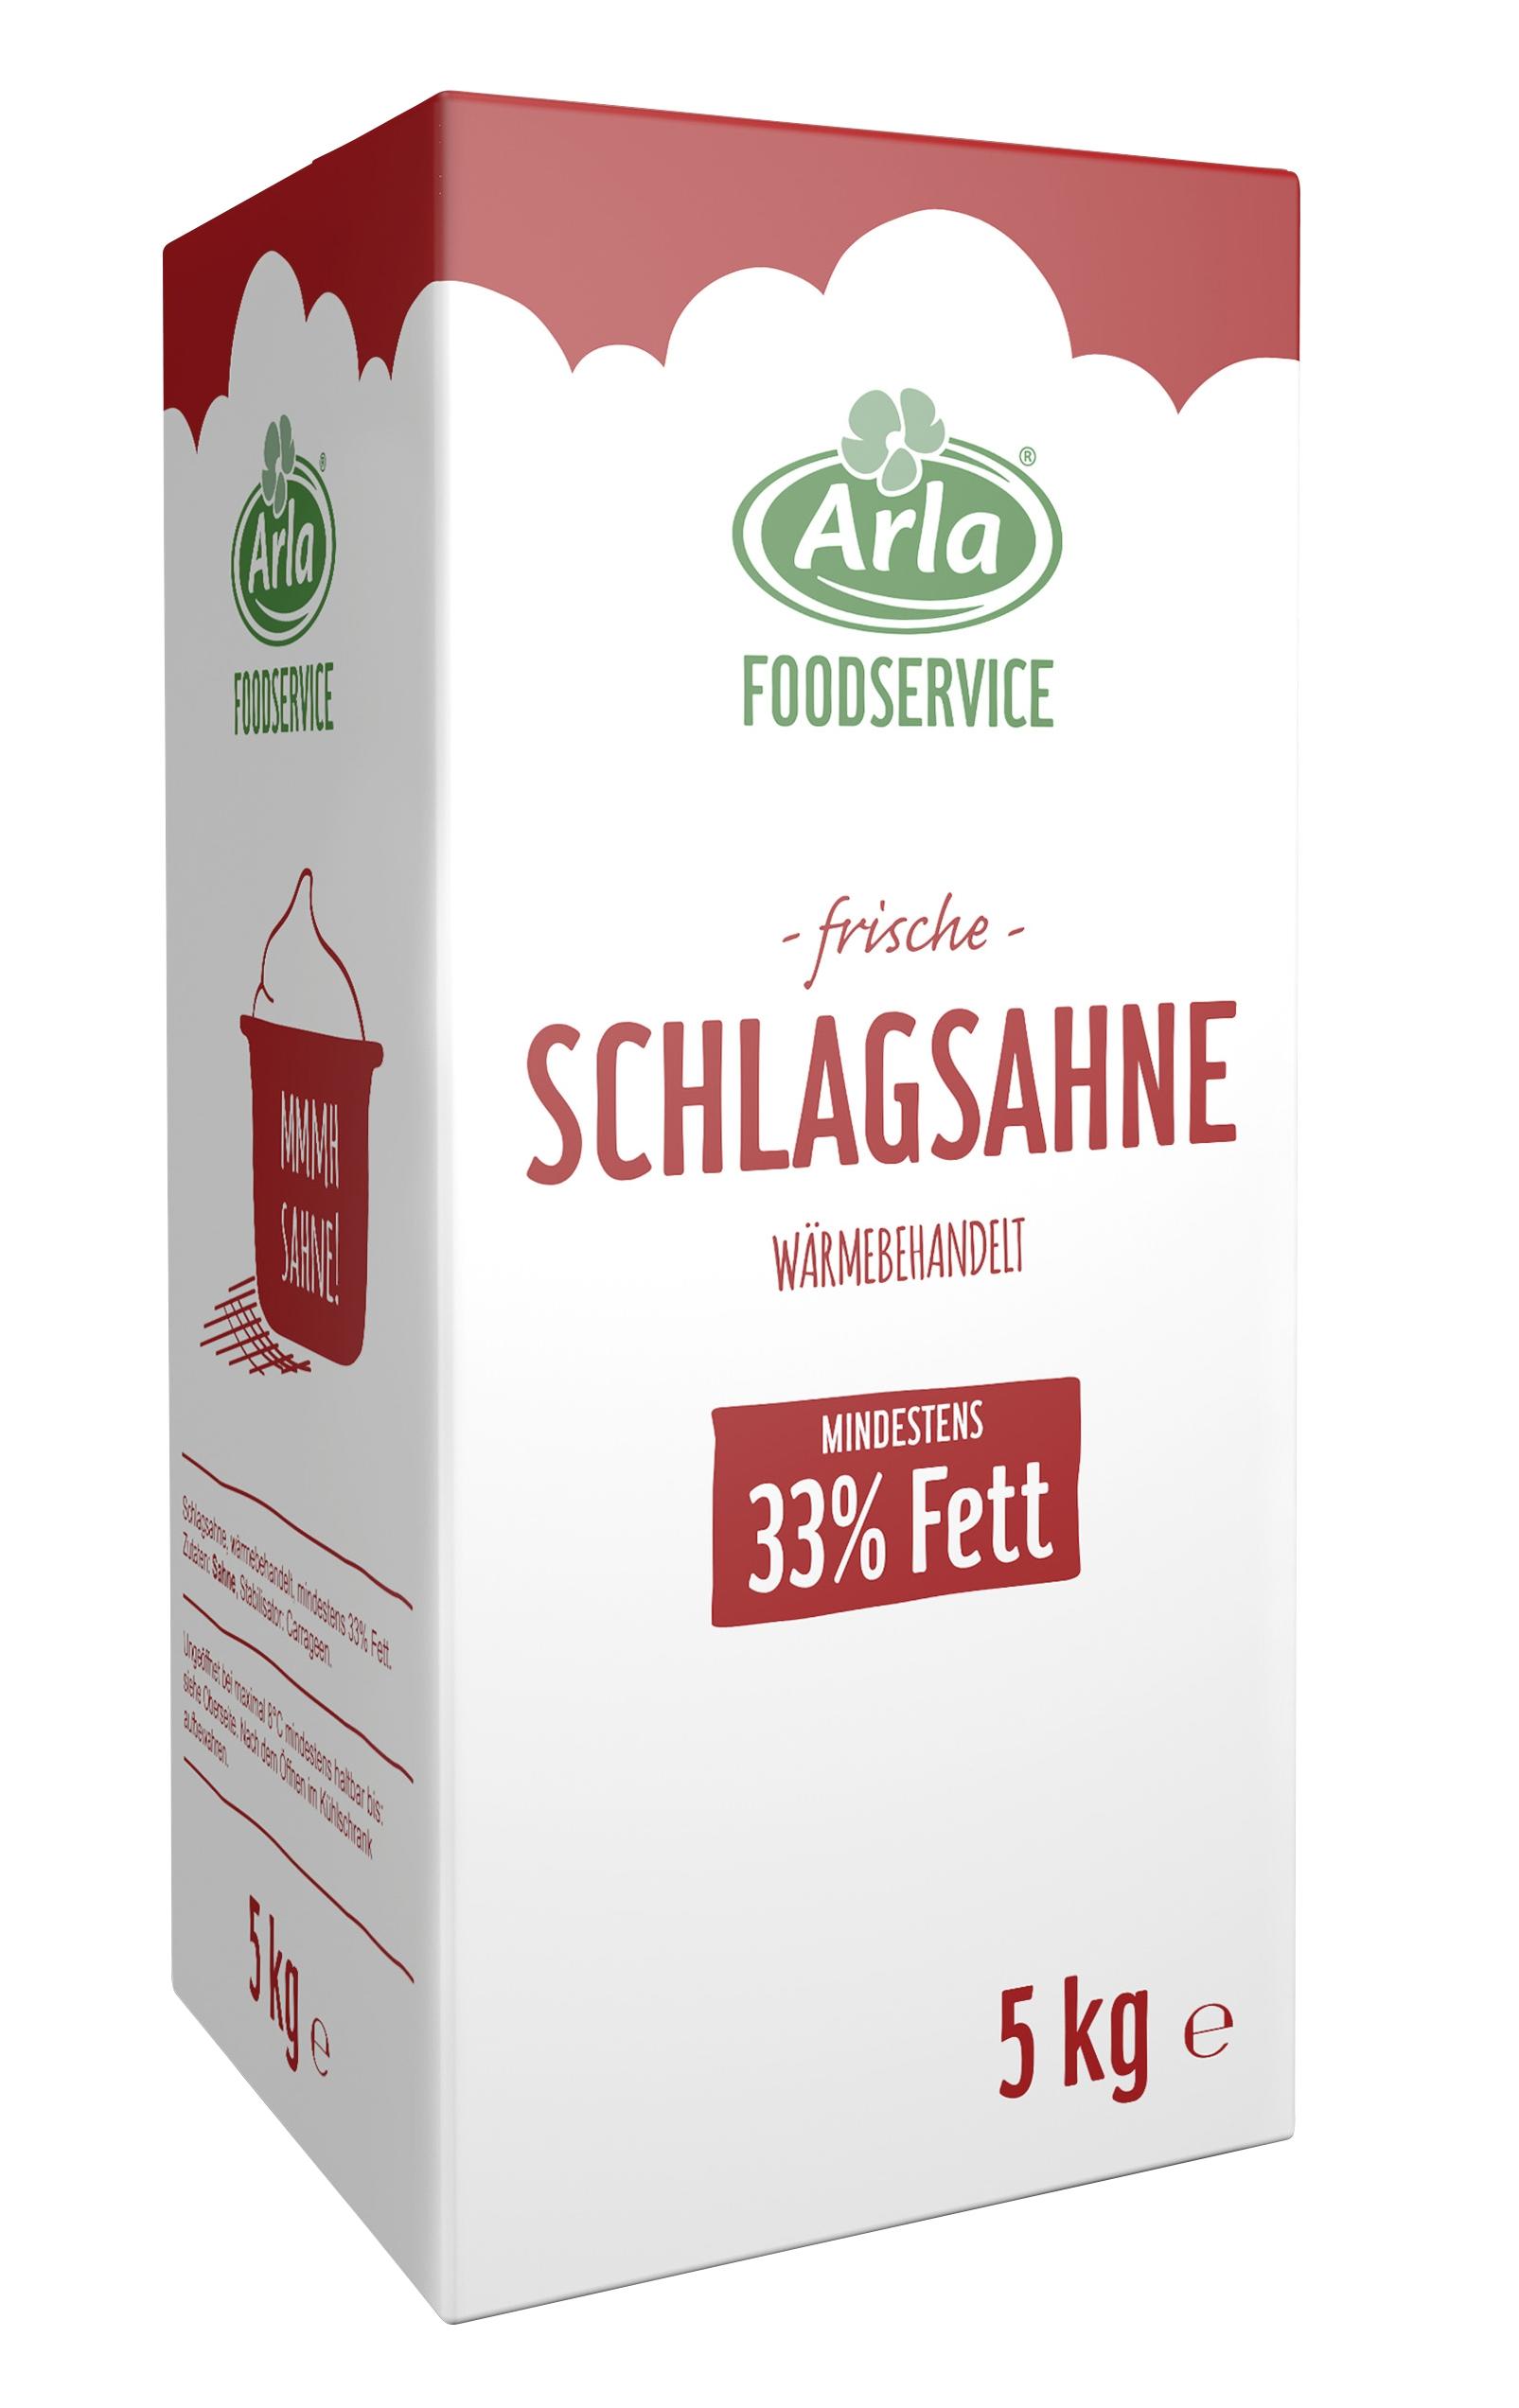 Arla Foodservice - 5kg Schlagsahne 33% 2016